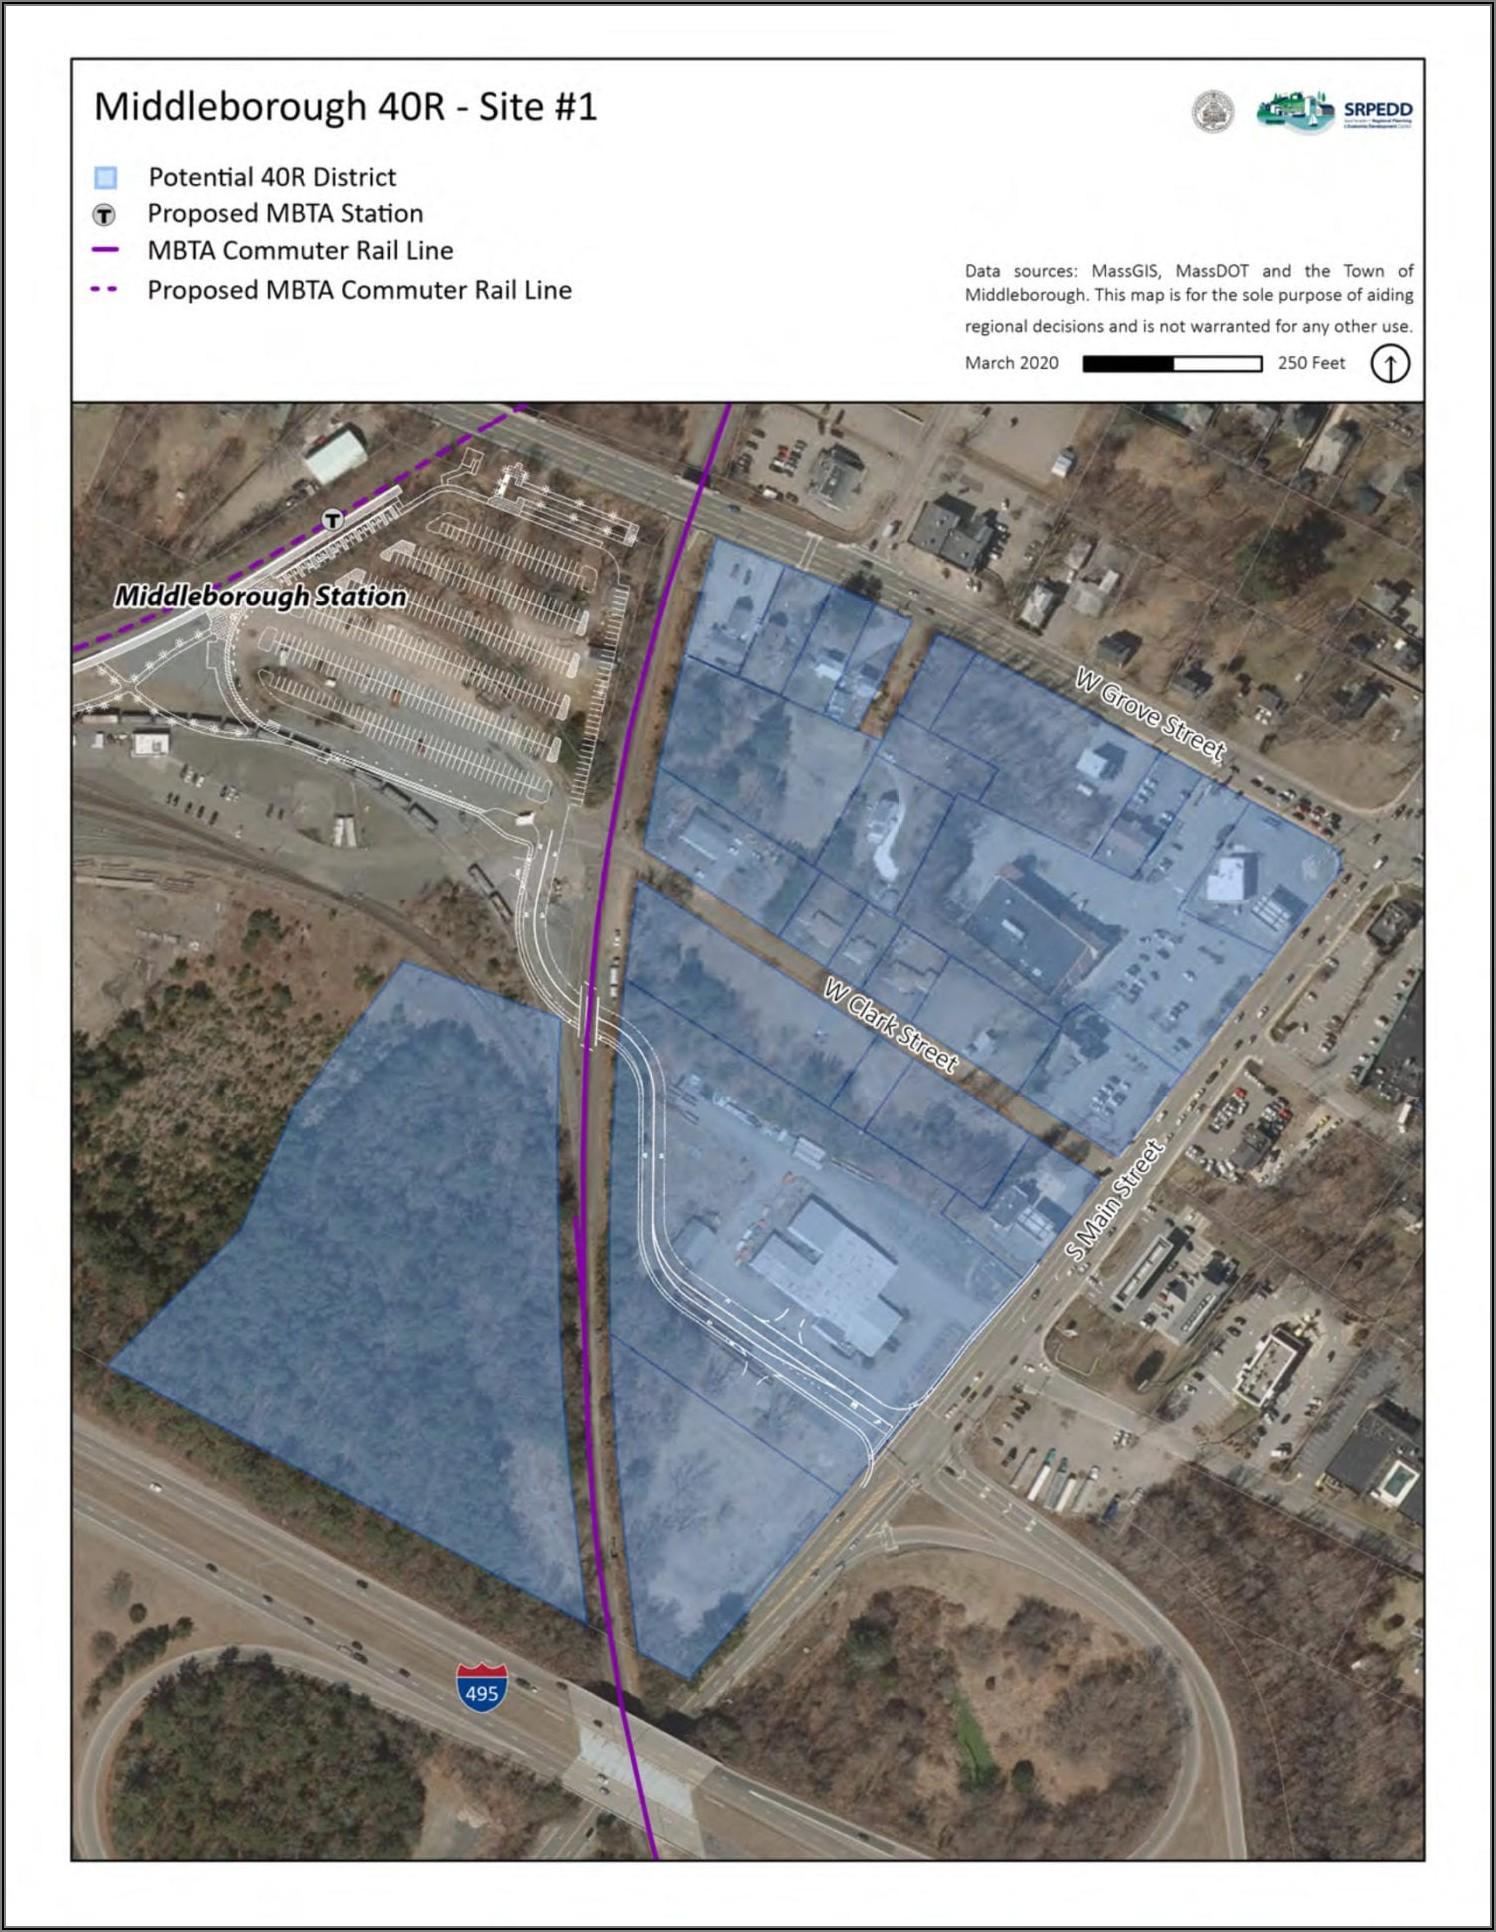 Mbta Commuter Rail Map Overlay